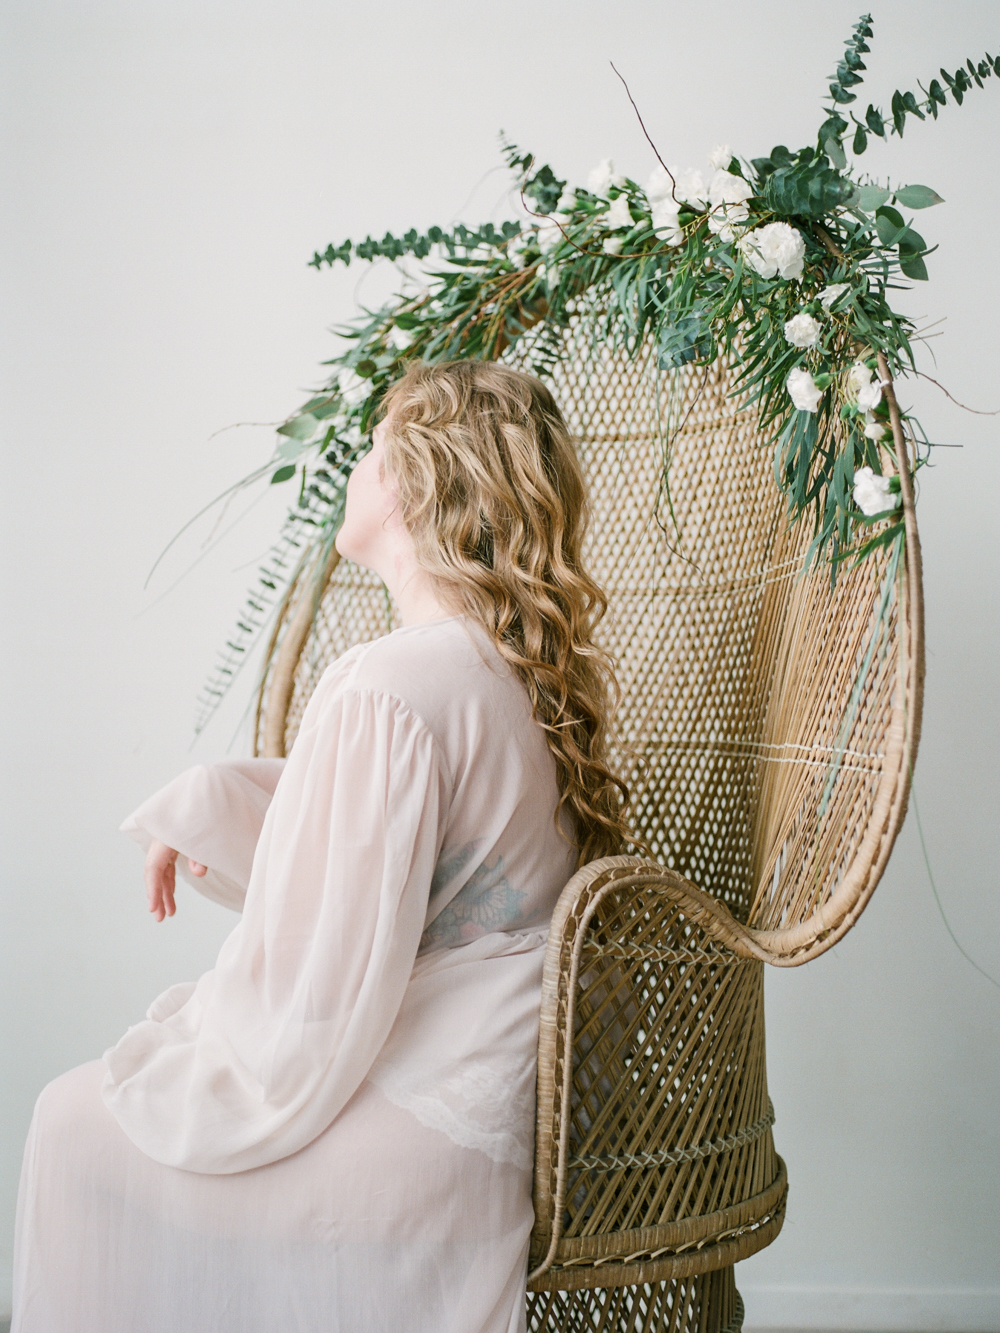 houston-boudoir-photographer-film-photographer-studio-intimate-simple-organic-boho-flowers-neutral-redhead-portraits-6.jpg